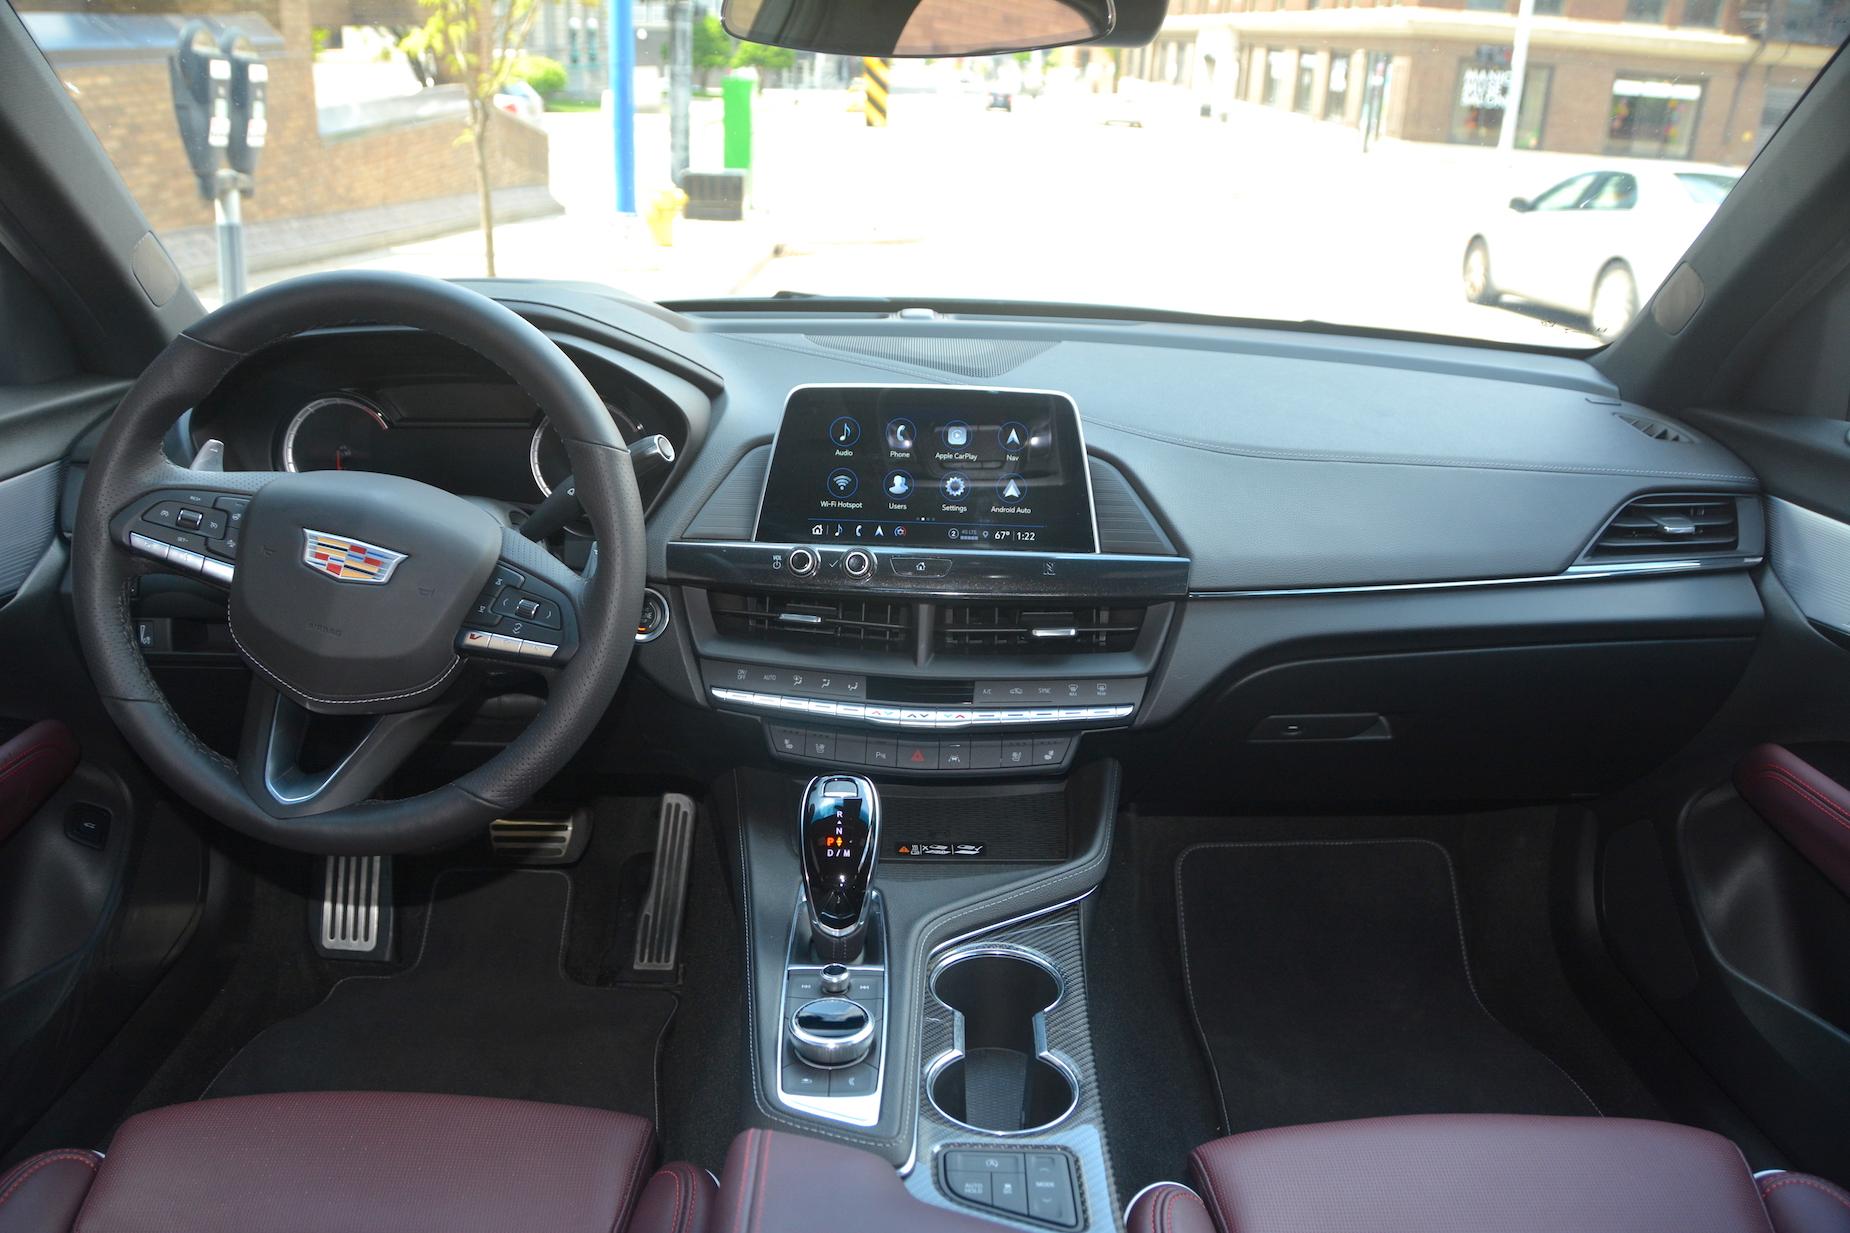 2021 Cadillac CT4-V cabin